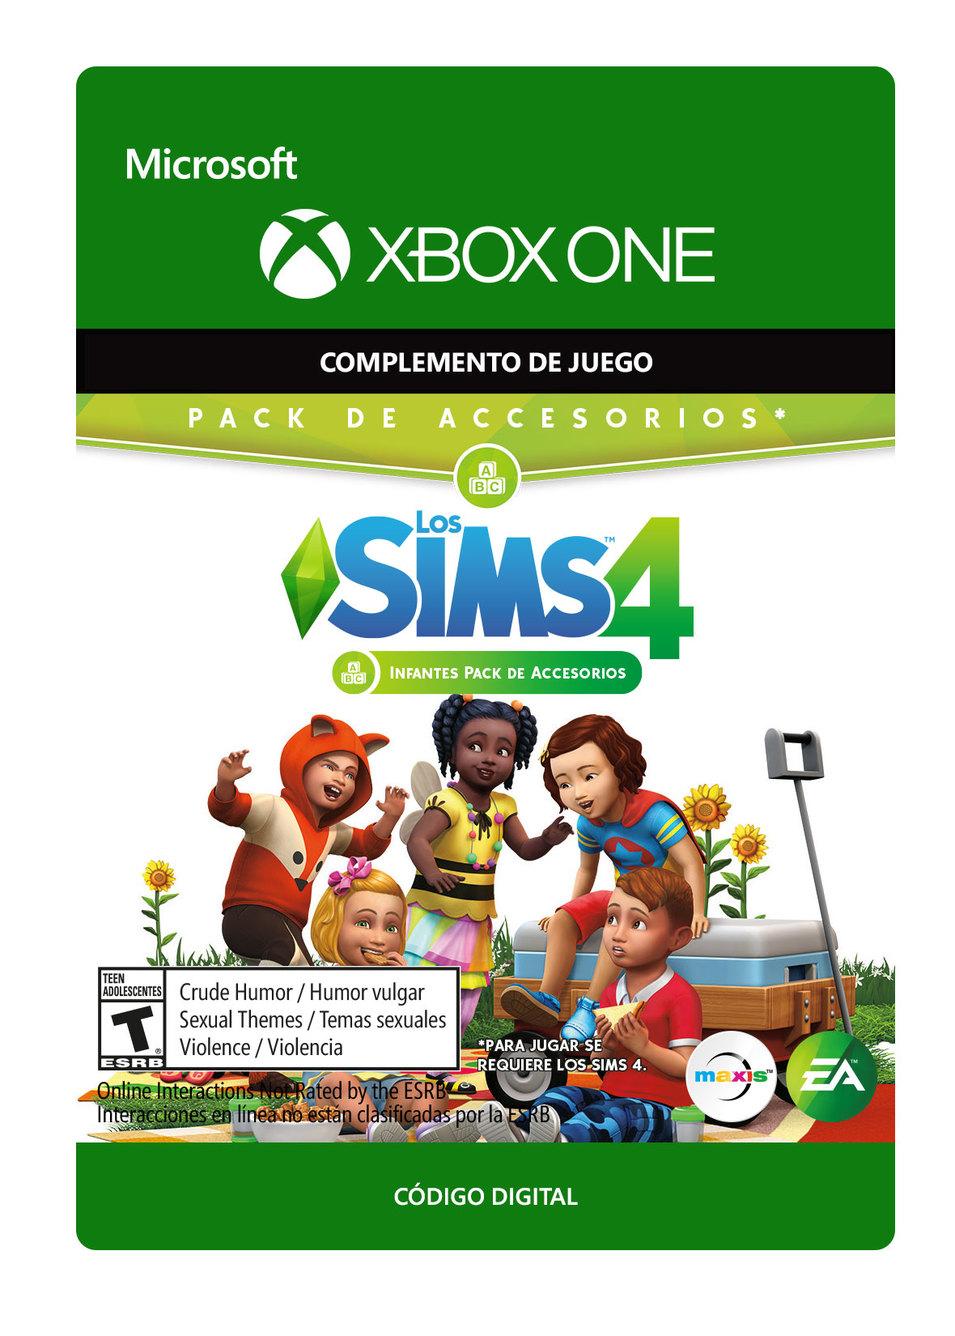 The Sims 4 Infantes Pack de Accesorios